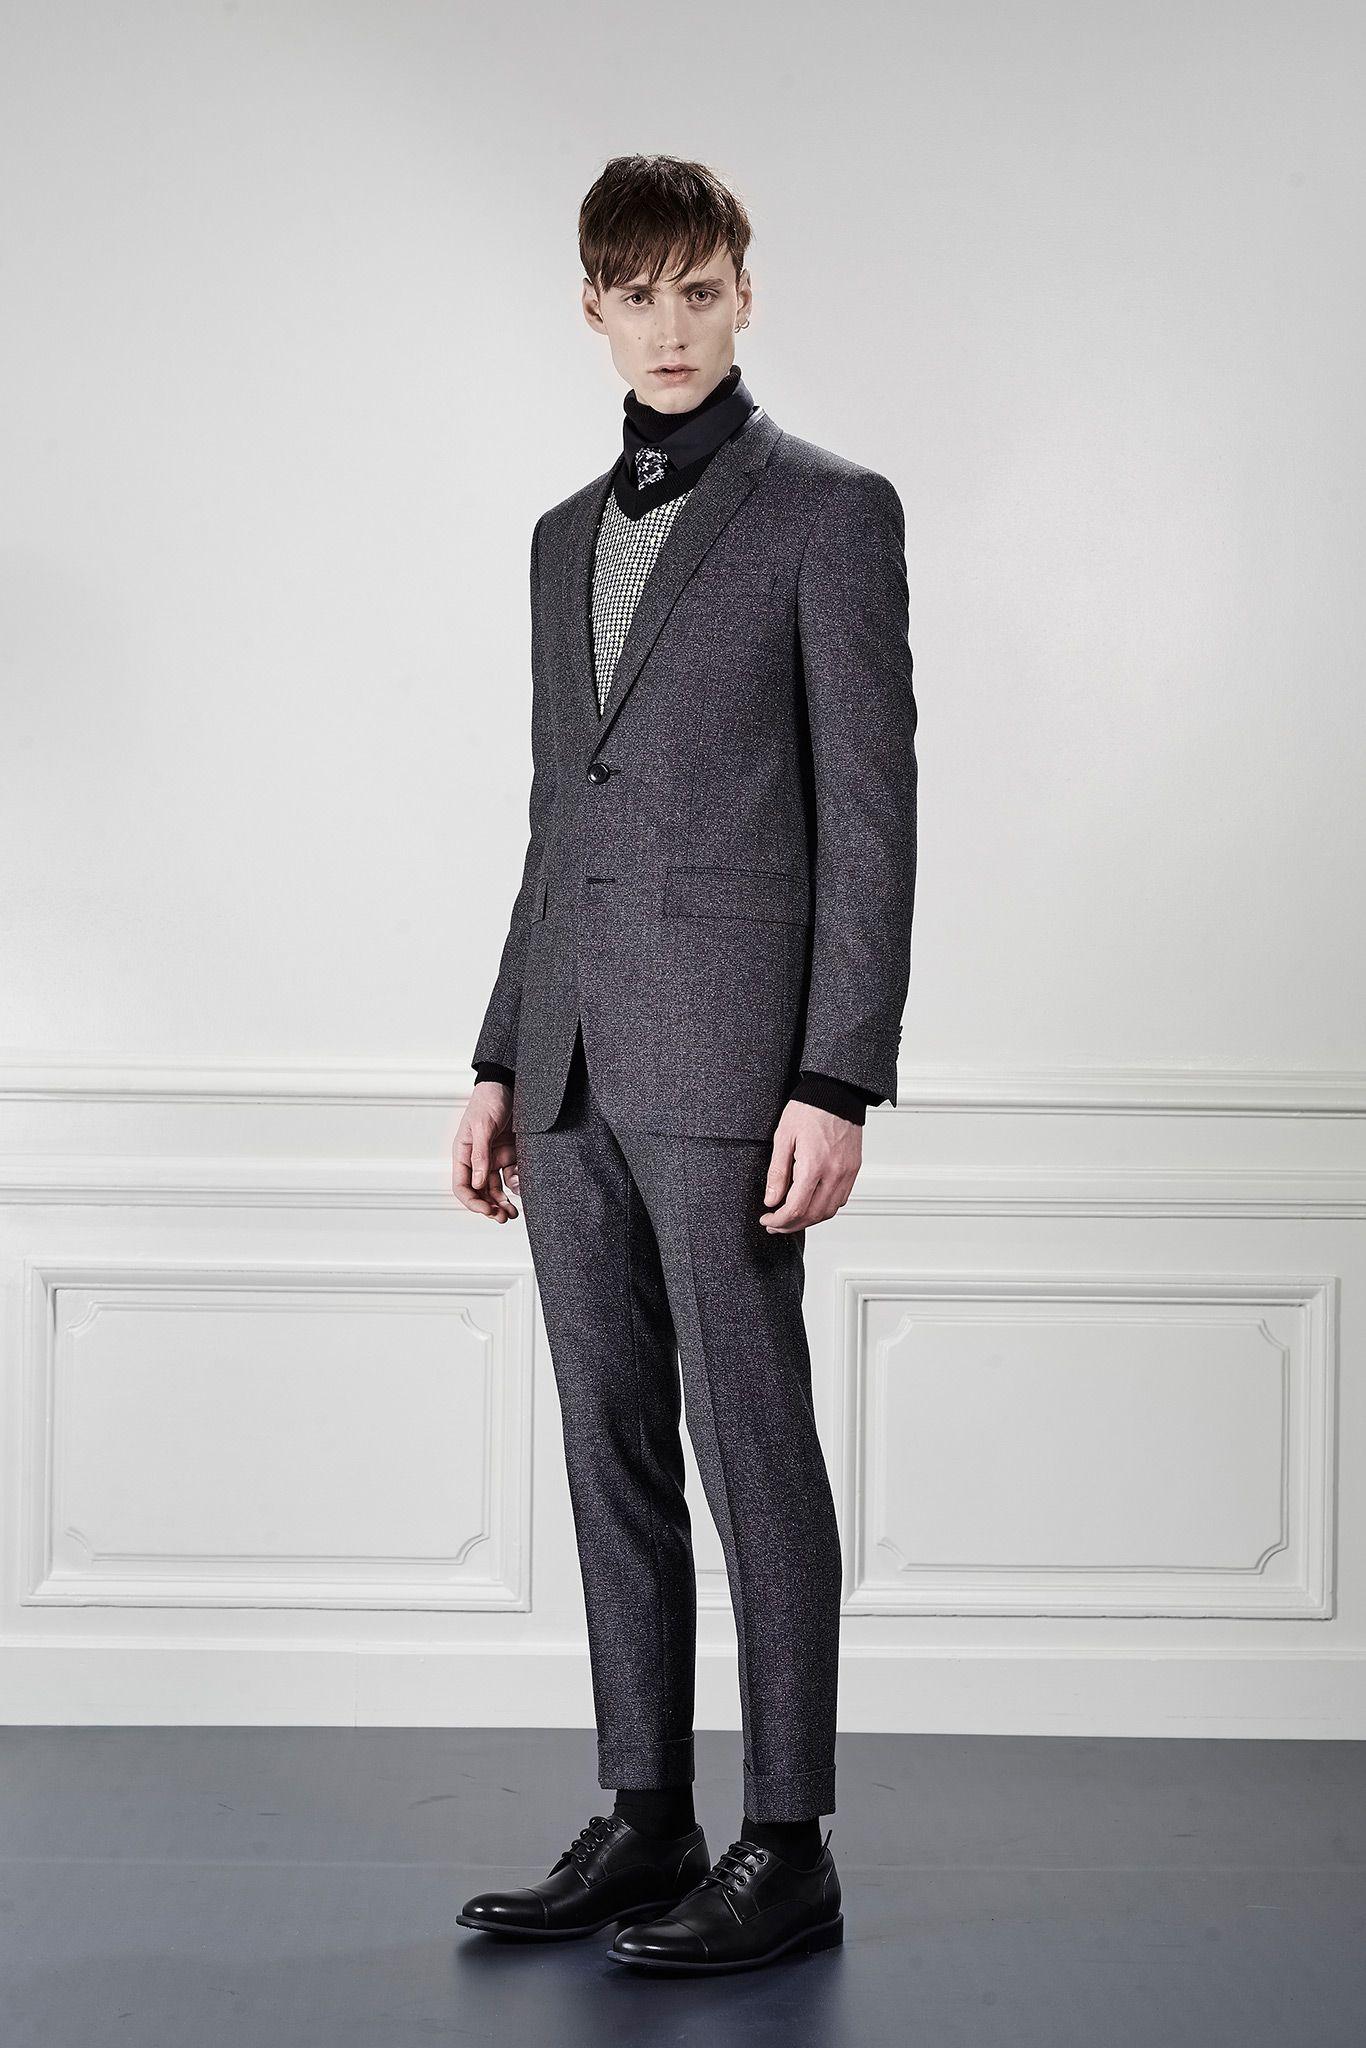 Viktor & Rolf - Fall 2015 Menswear - Look 6 of 24